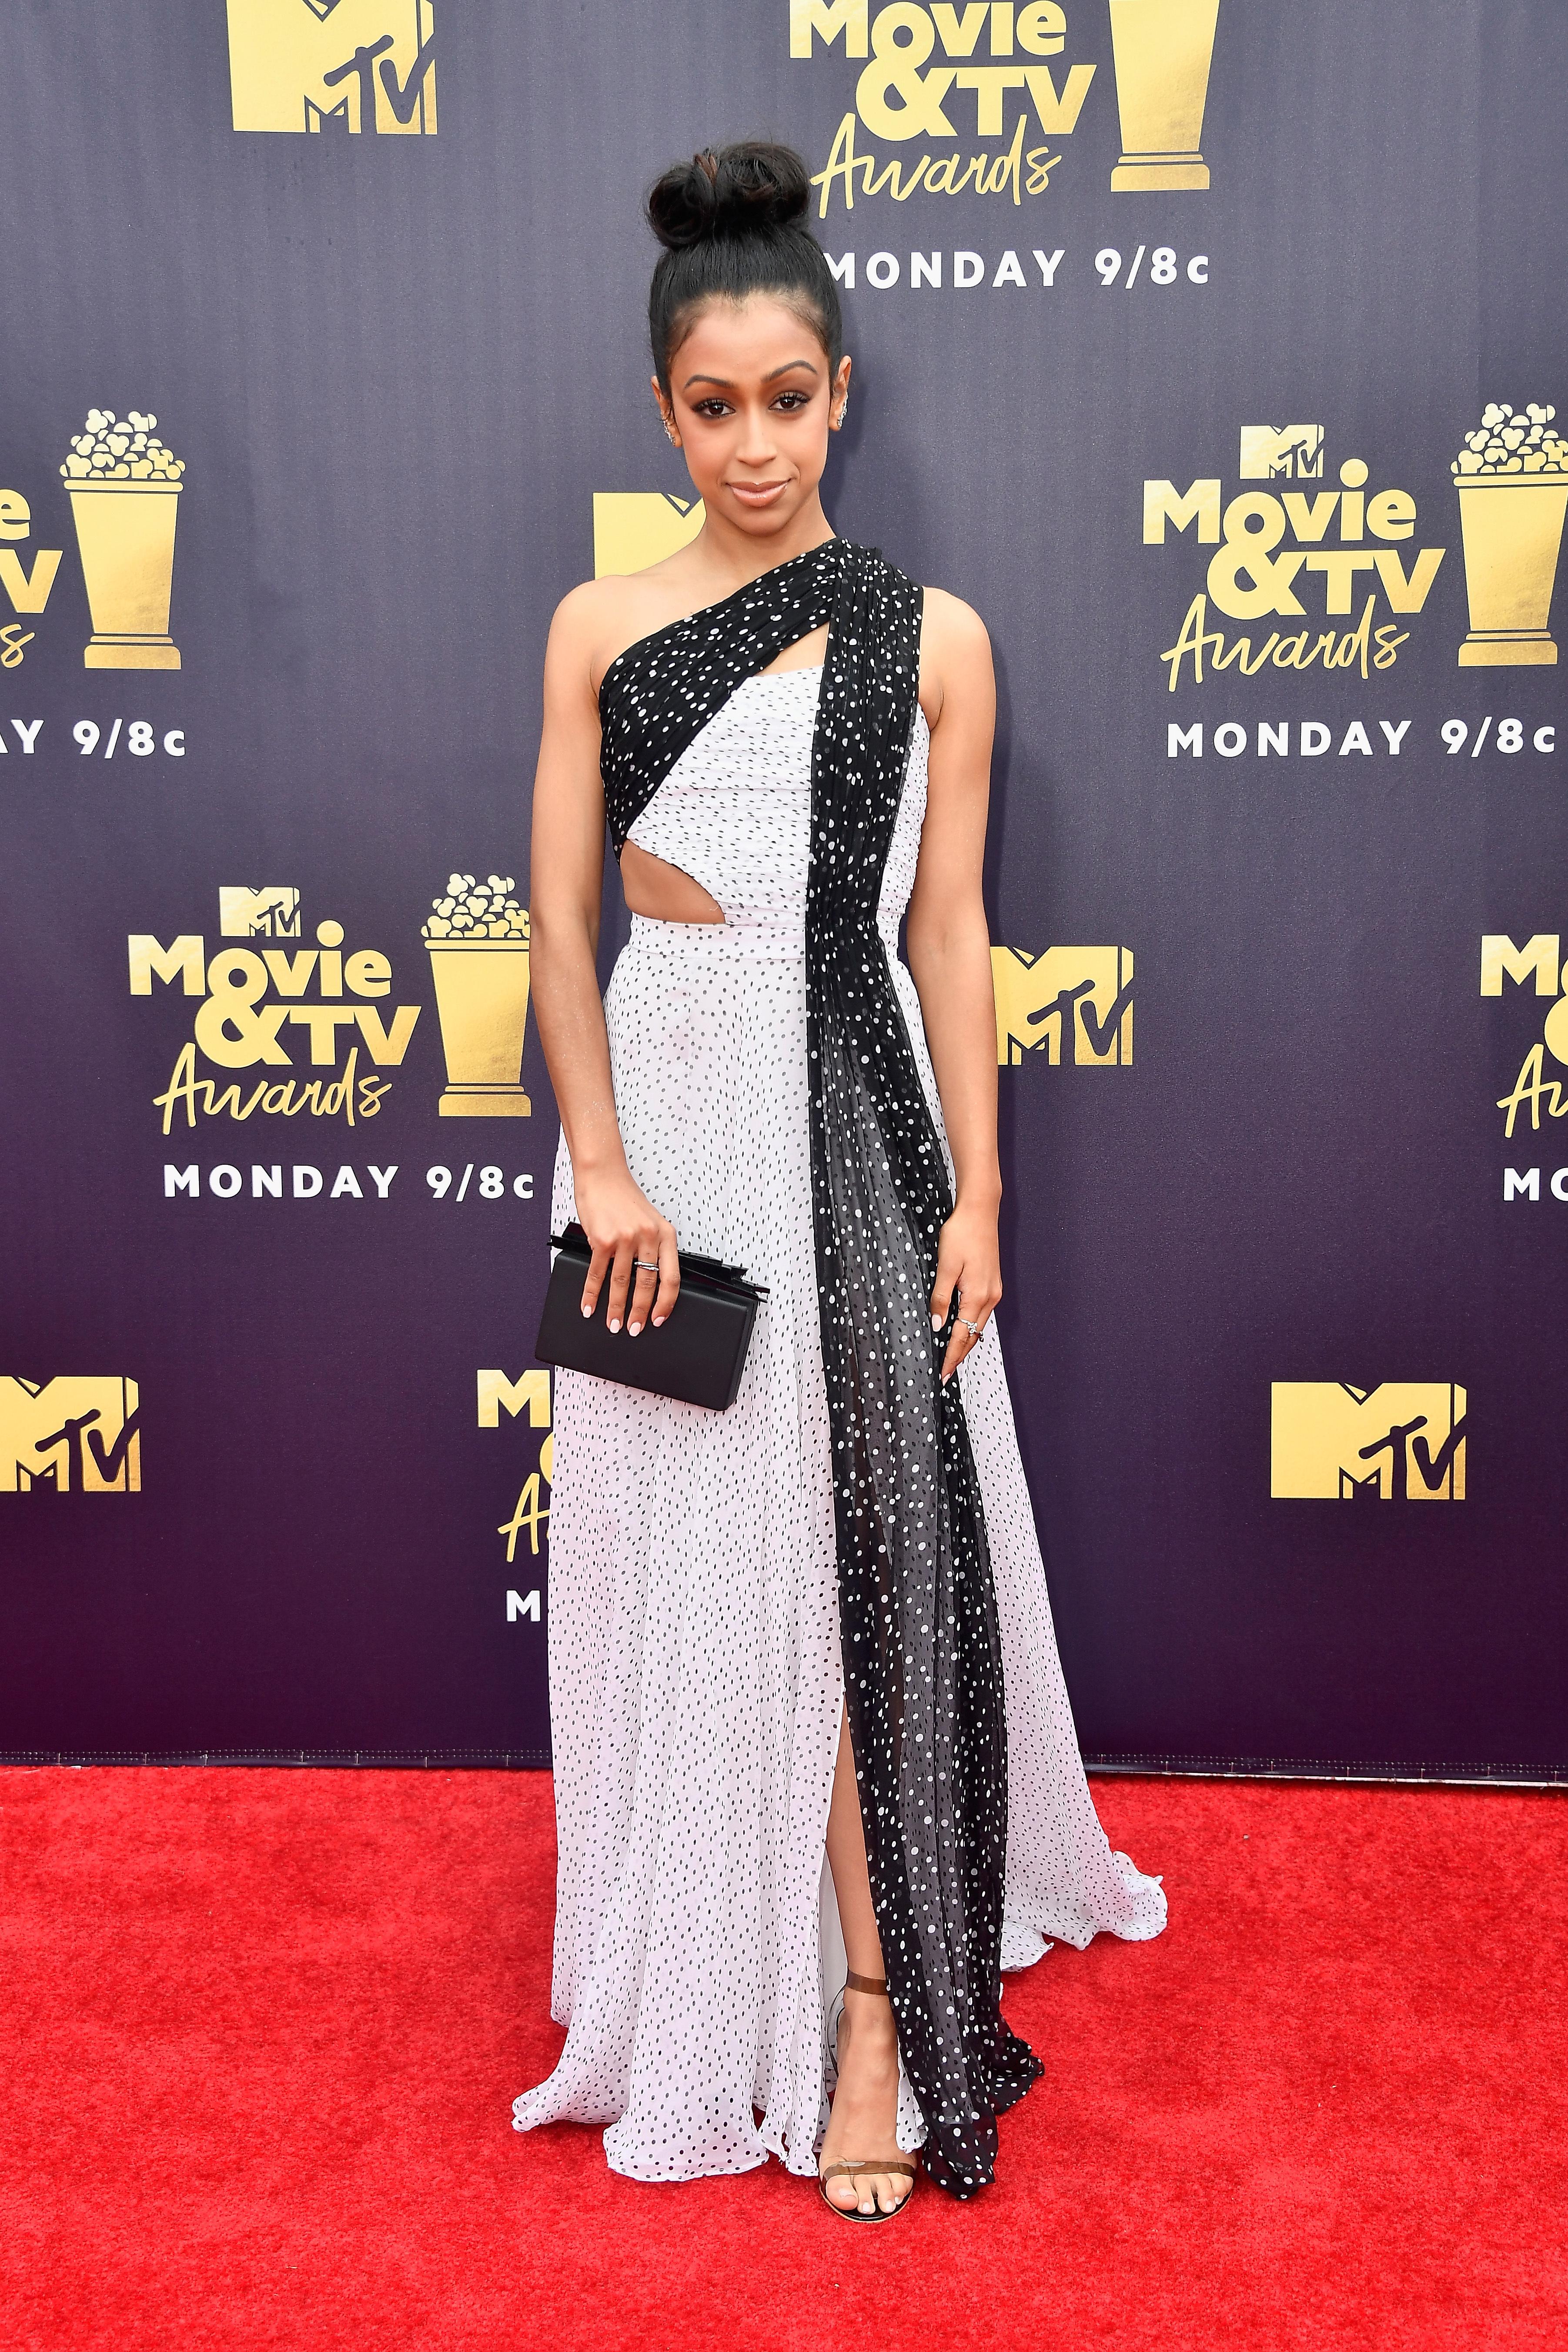 Liza Koshy attends the MTV Movie & TV Awards in Los Angeles on June 16, 2018.